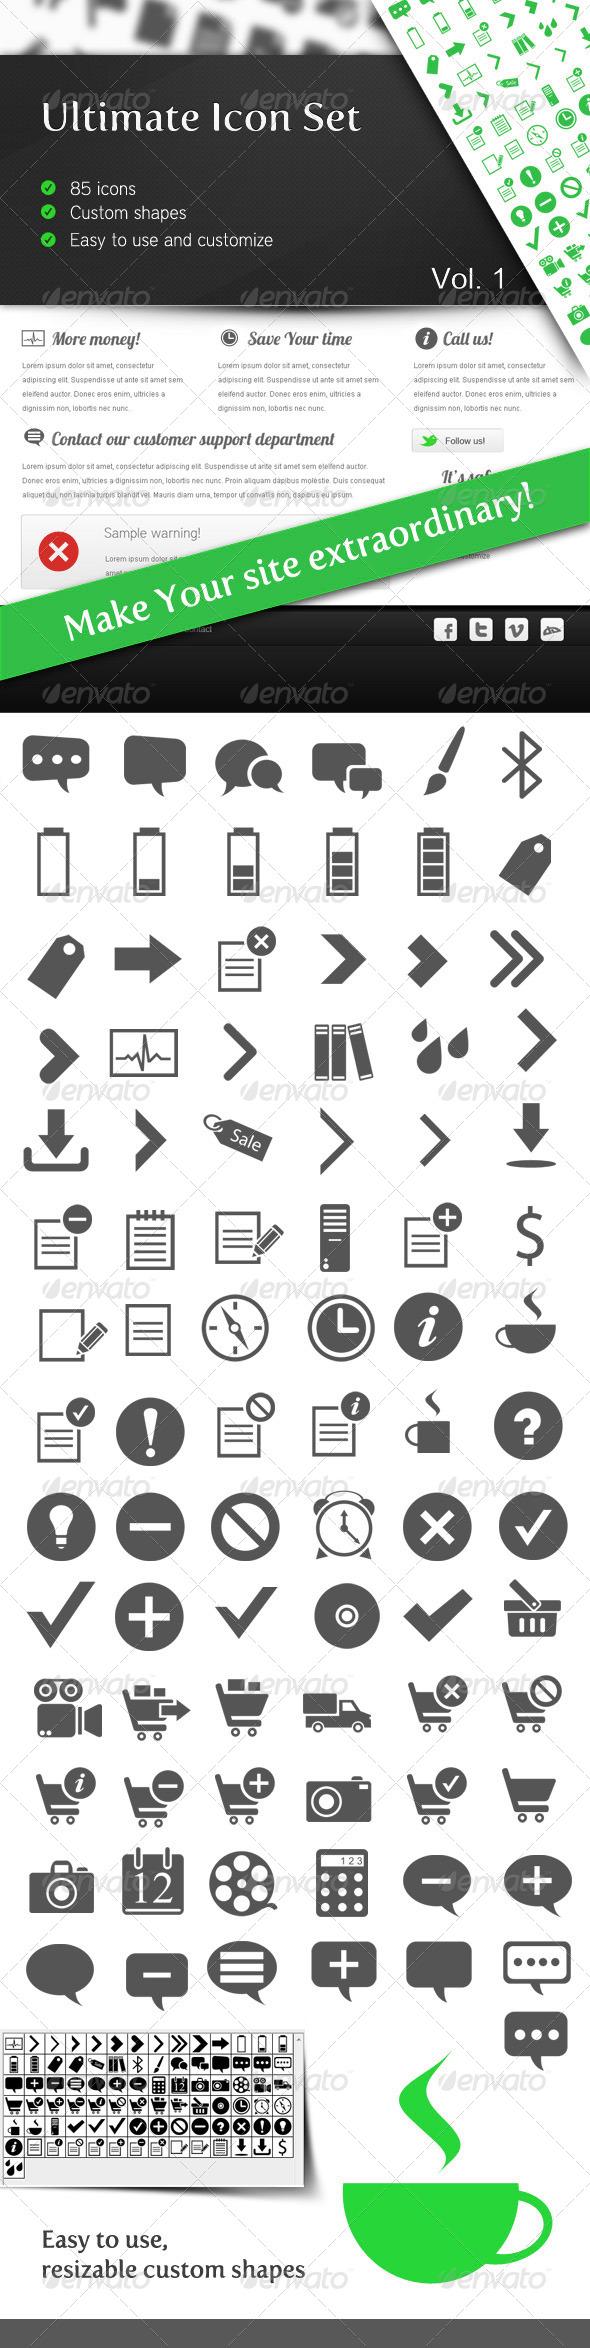 Ultimate Icon Set Vol 1 Symbols Shapes Icon set